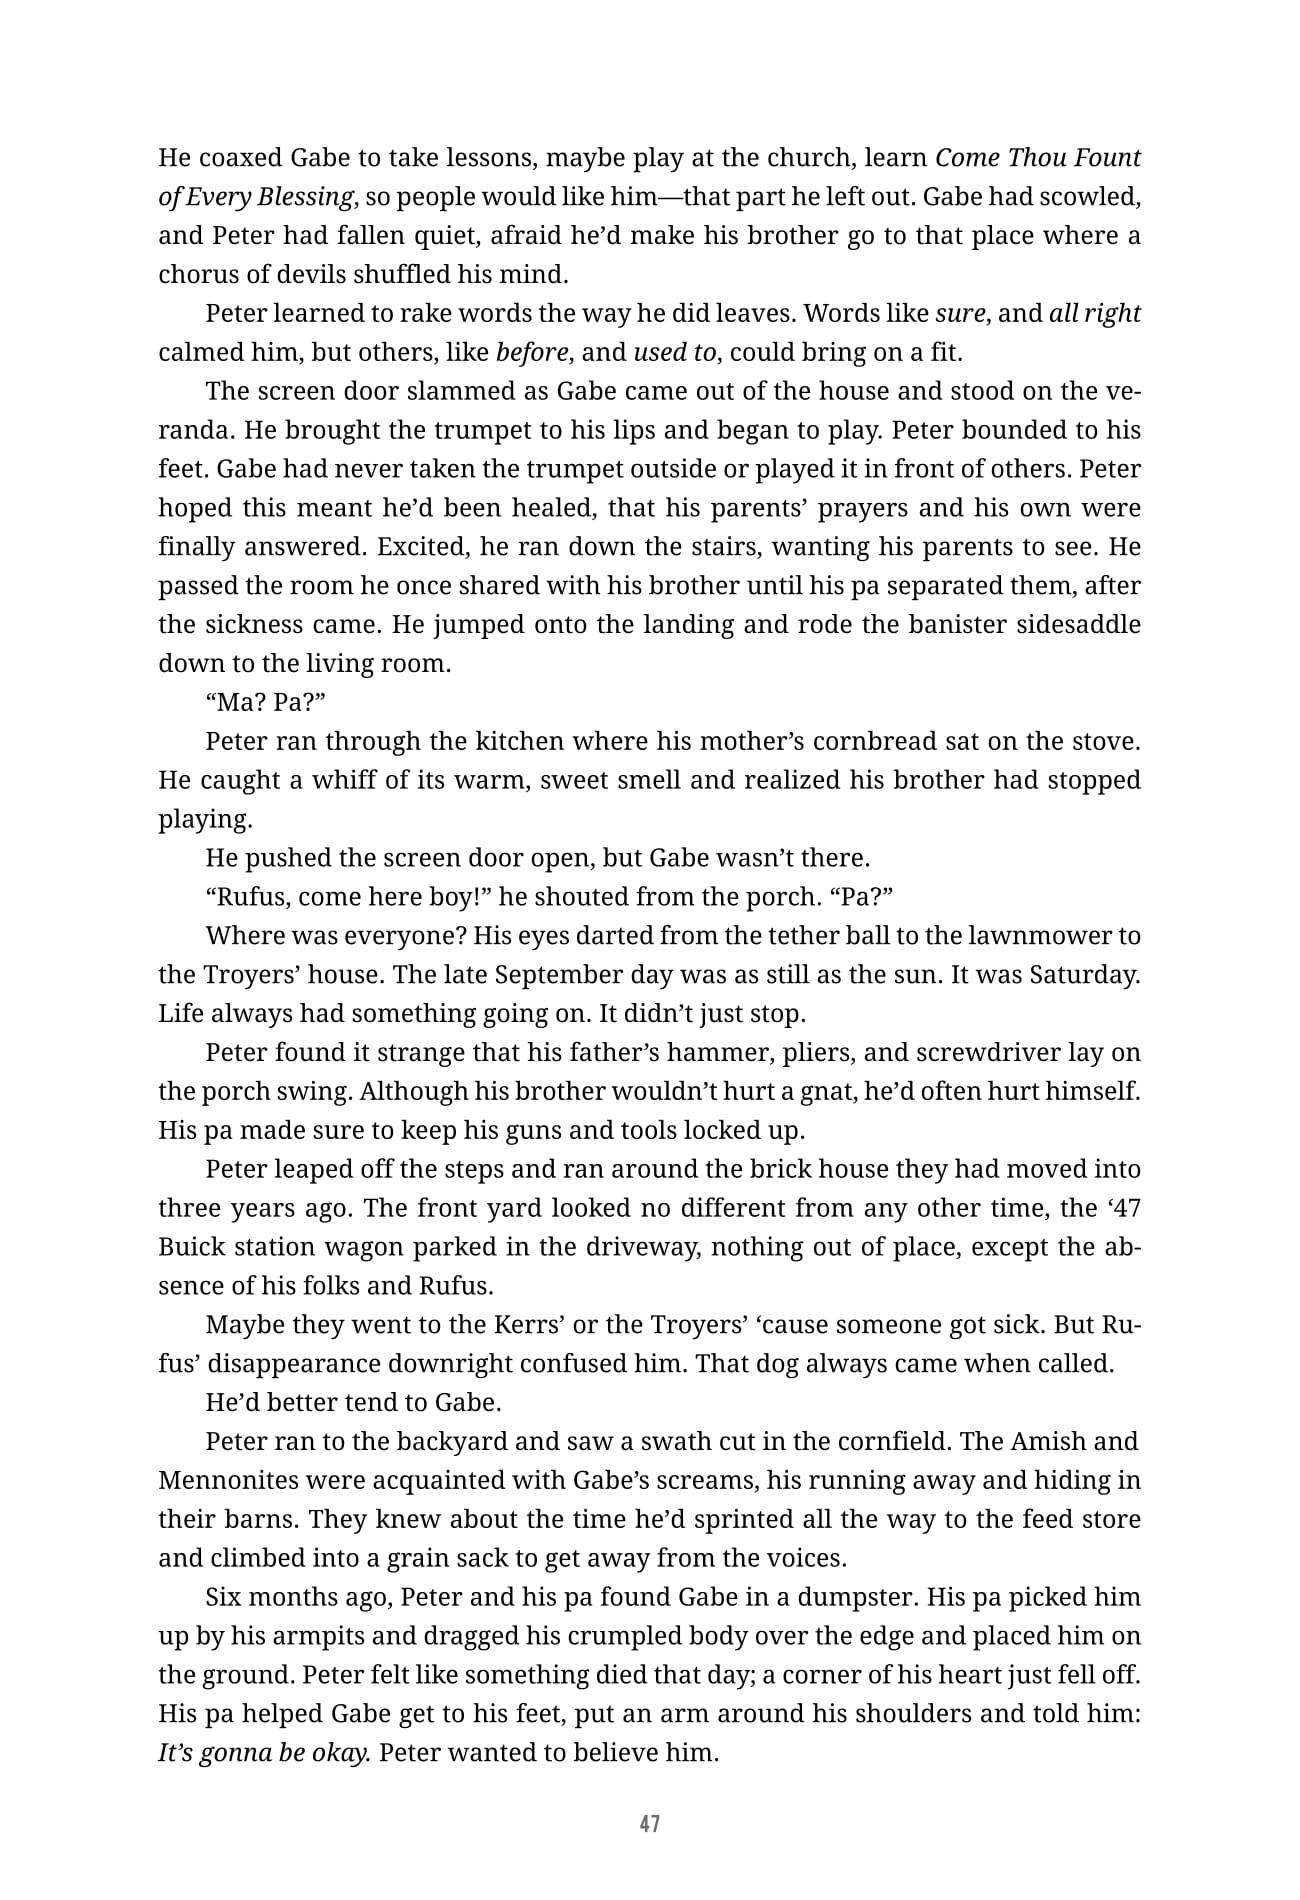 Final_PDF.48-1.jpg